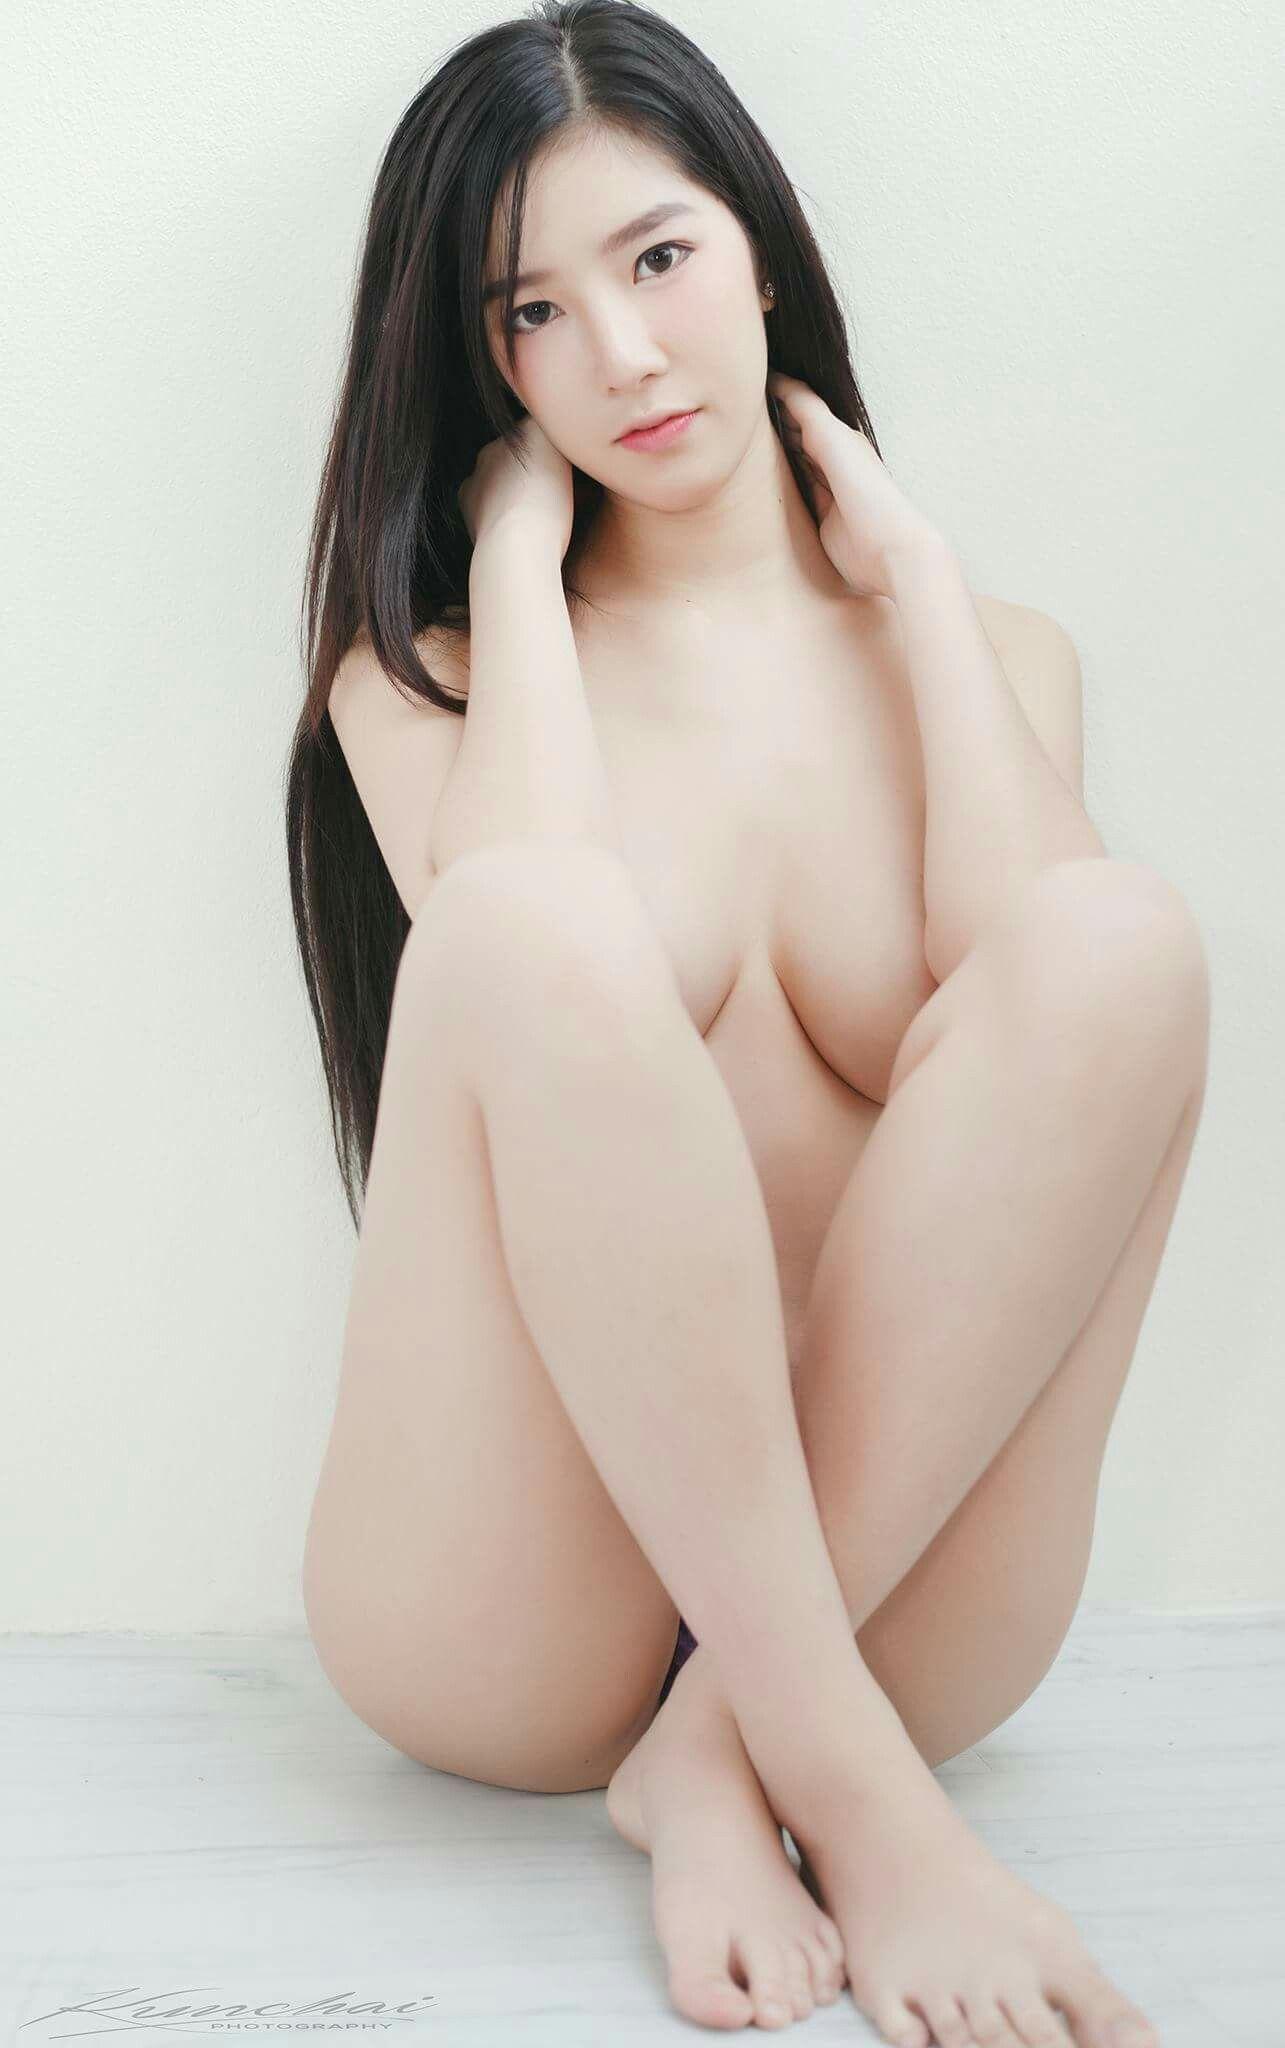 cool Asian girl